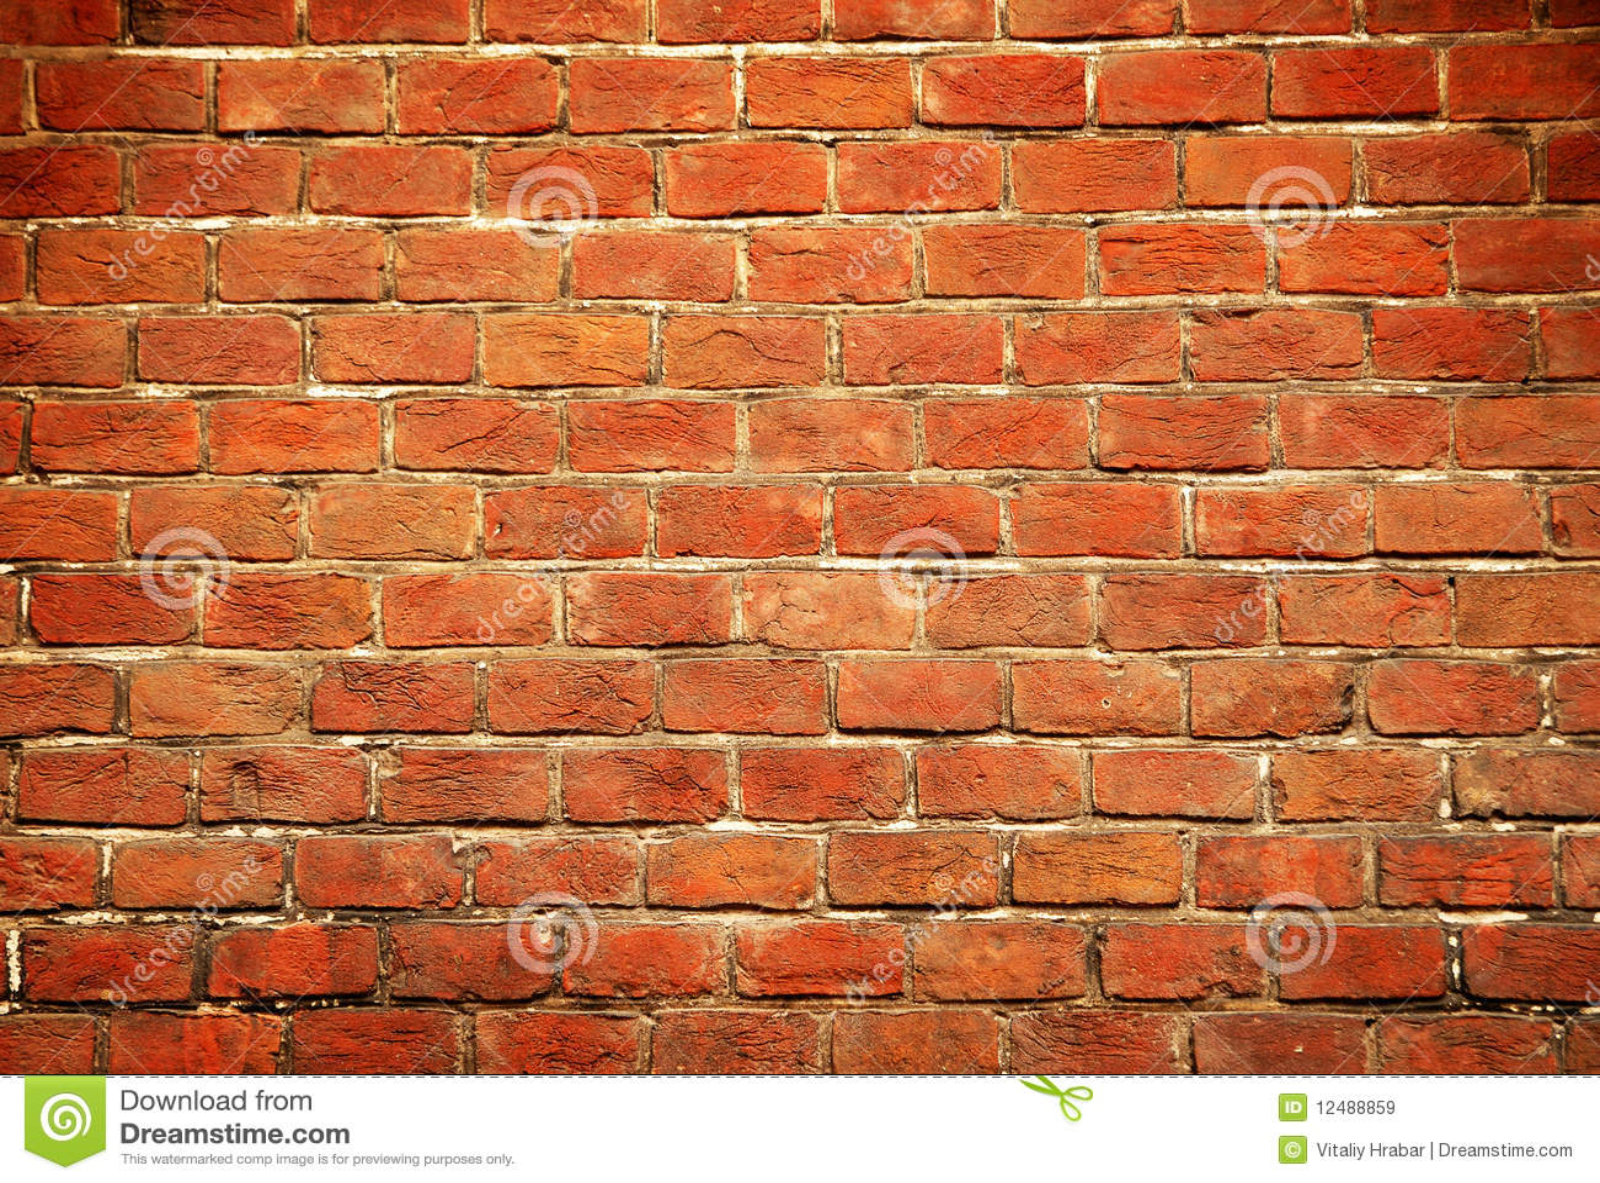 Old Brick Wall Royalty Free Stock Images Image 12488859